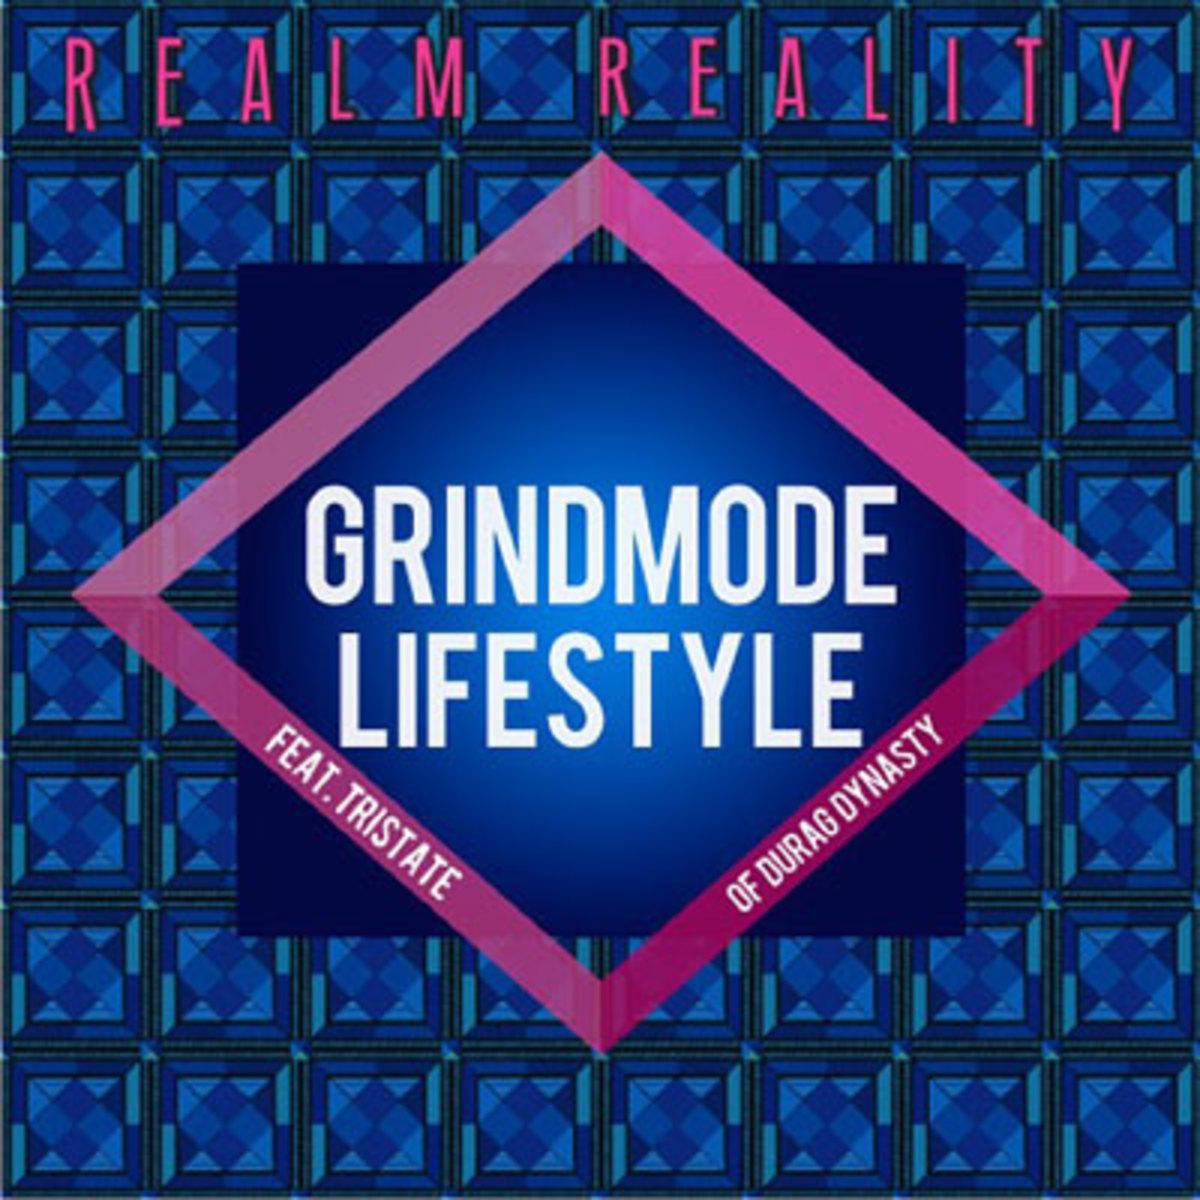 realmreality-grindmode.jpg